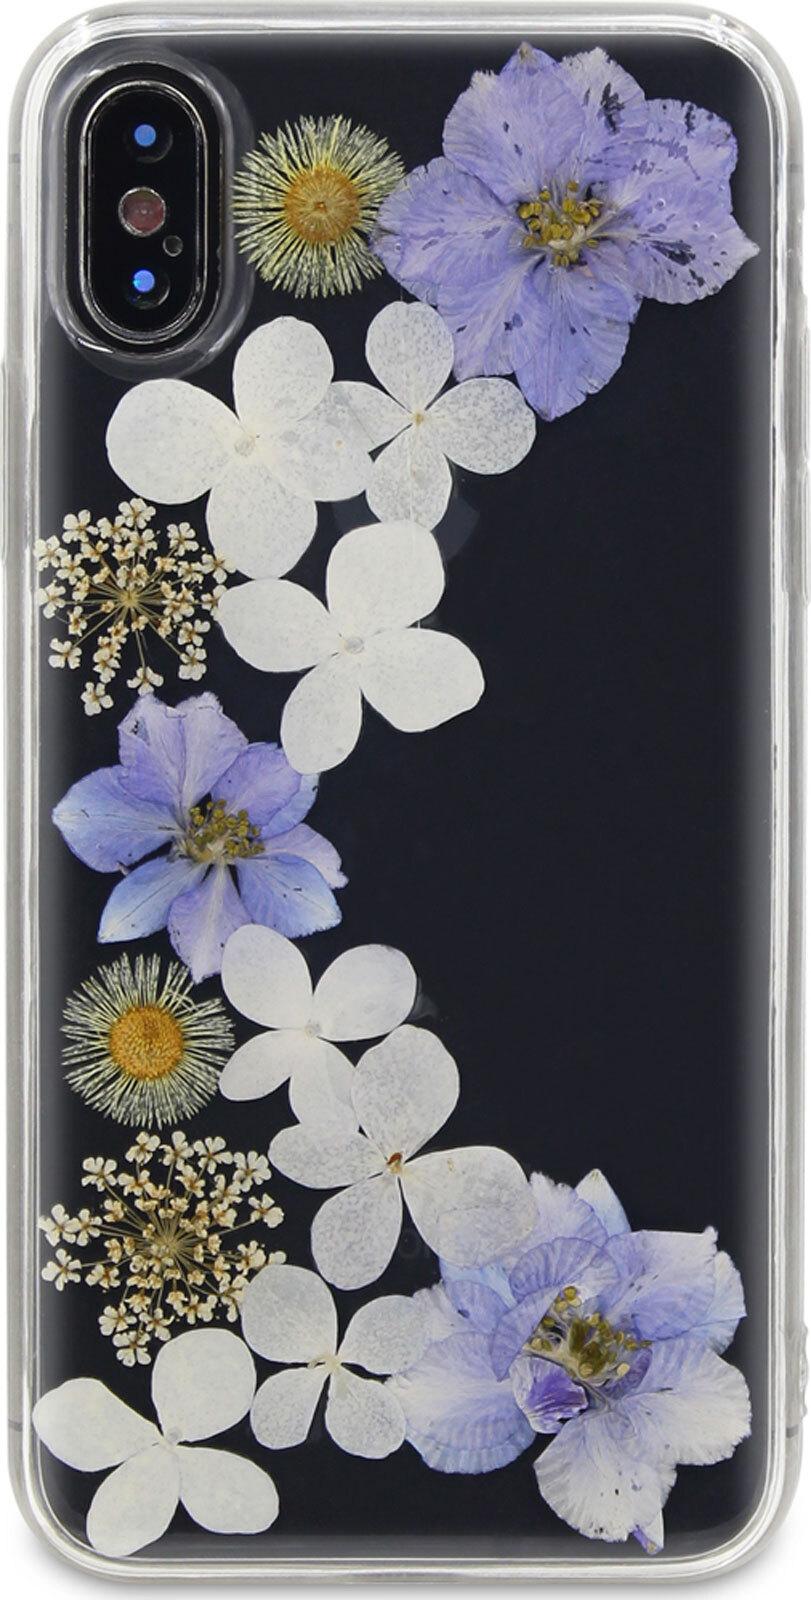 Чехол-накладка DYP Flower Case для Apple iPhone X/XS, прозрачный с цветами